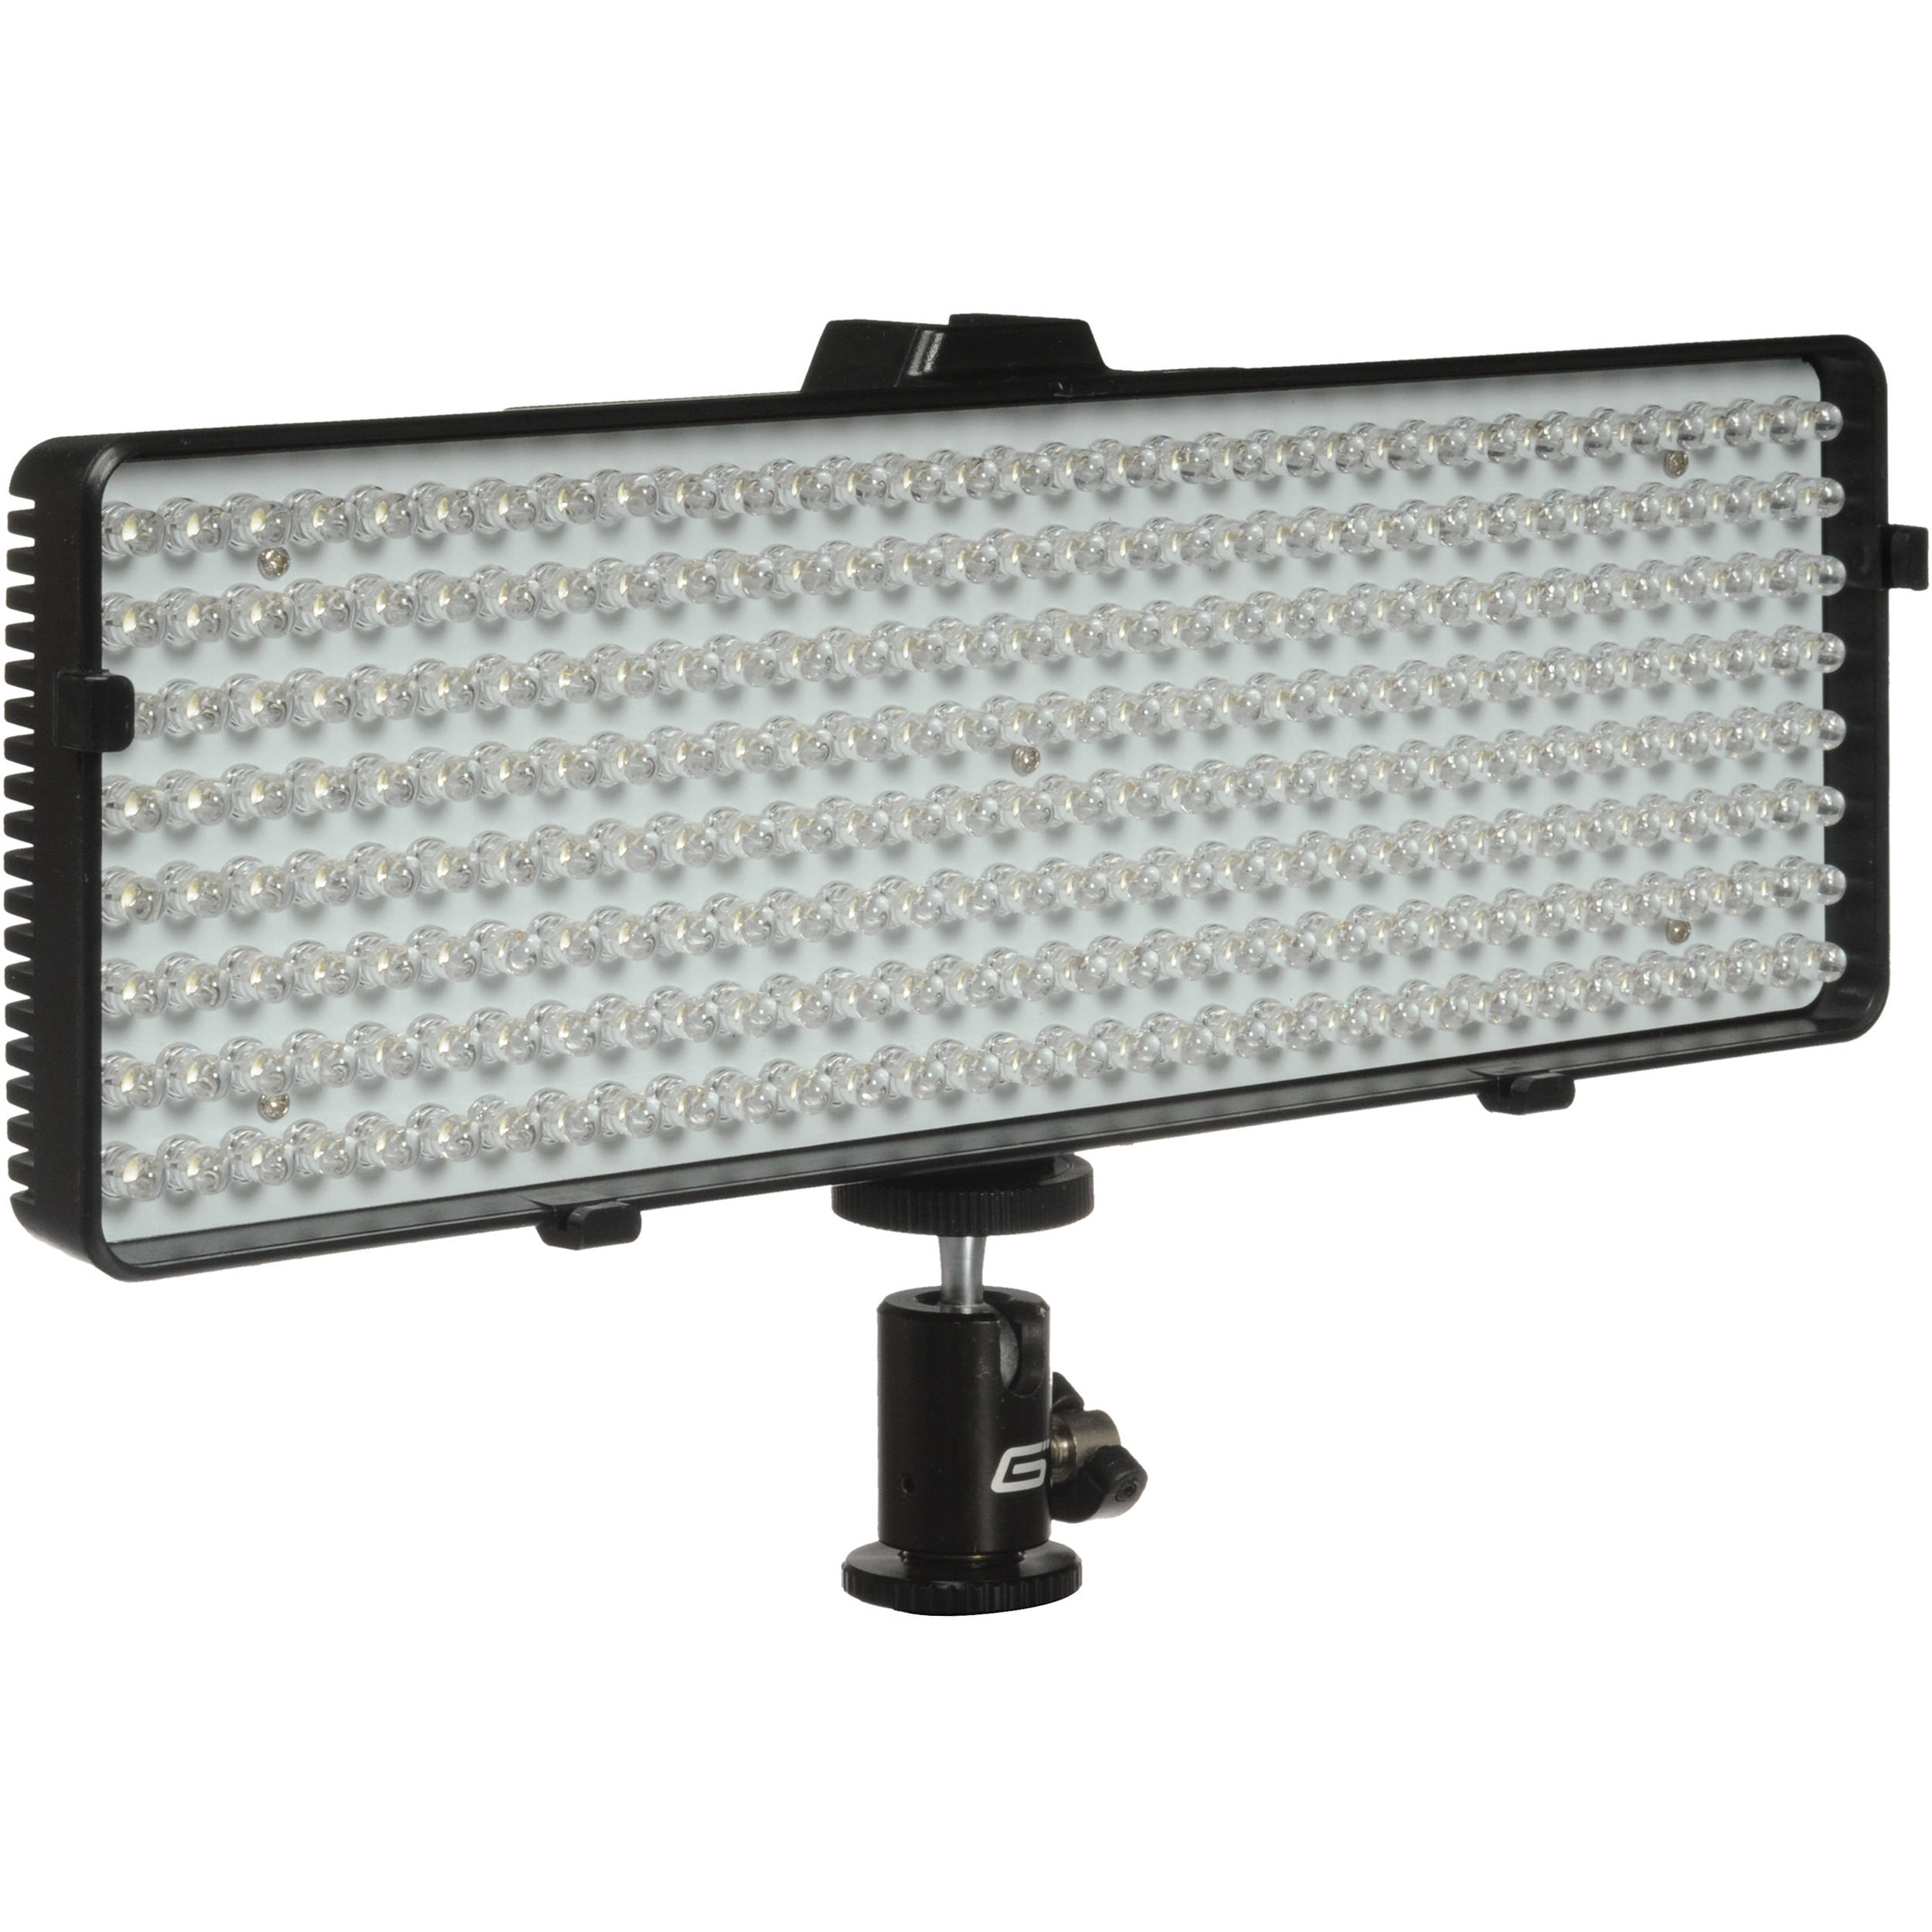 Genaray LED-7500T 320 LED Variable-Color On-Camera LED